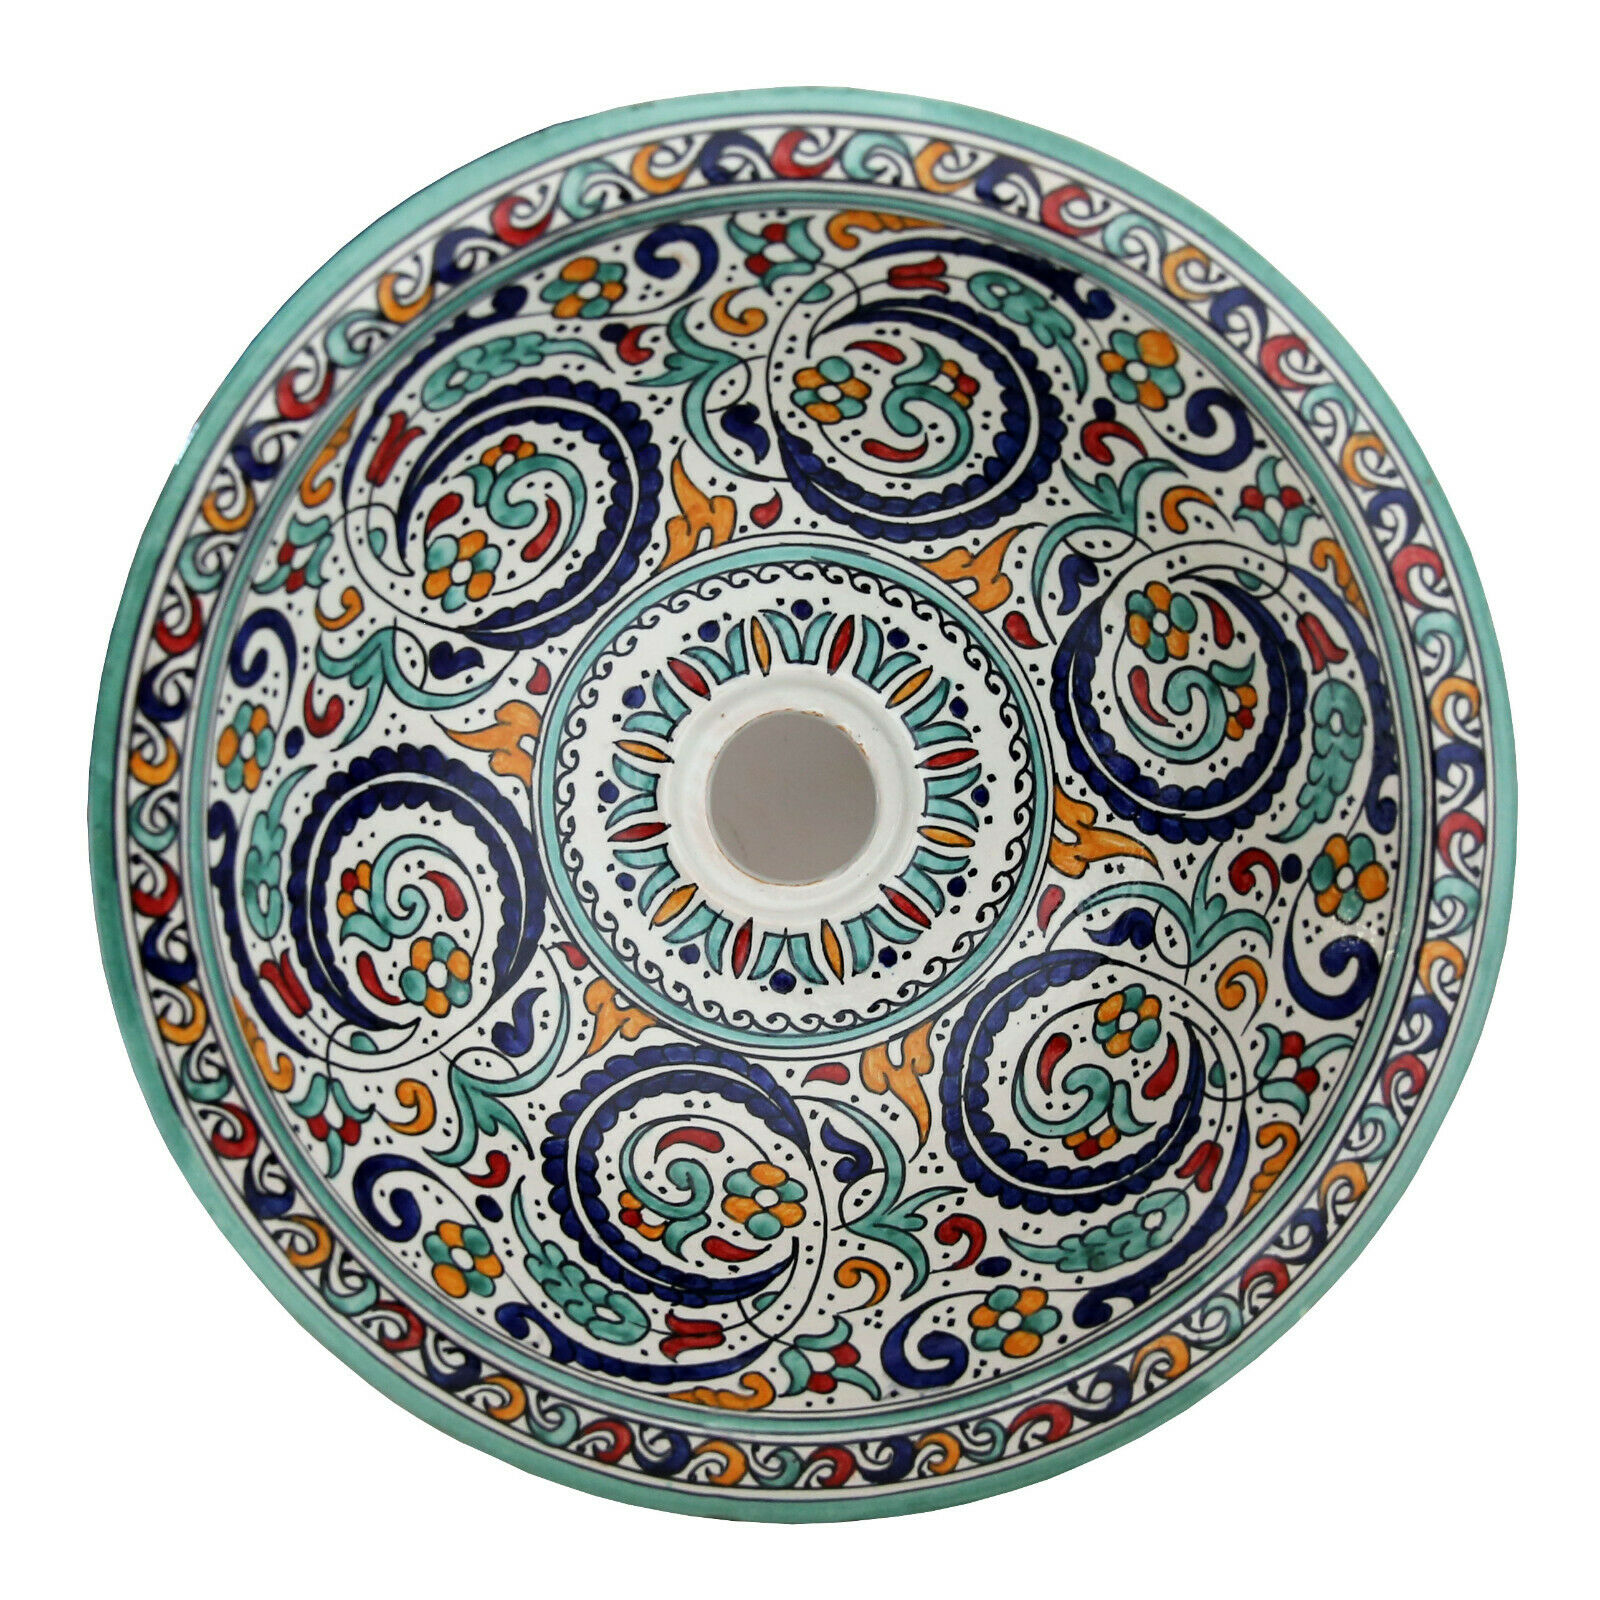 Marokkanisches Platillos Pintado a Mano rojoondo Lavabo Cerámica D41cm Fes-Xi